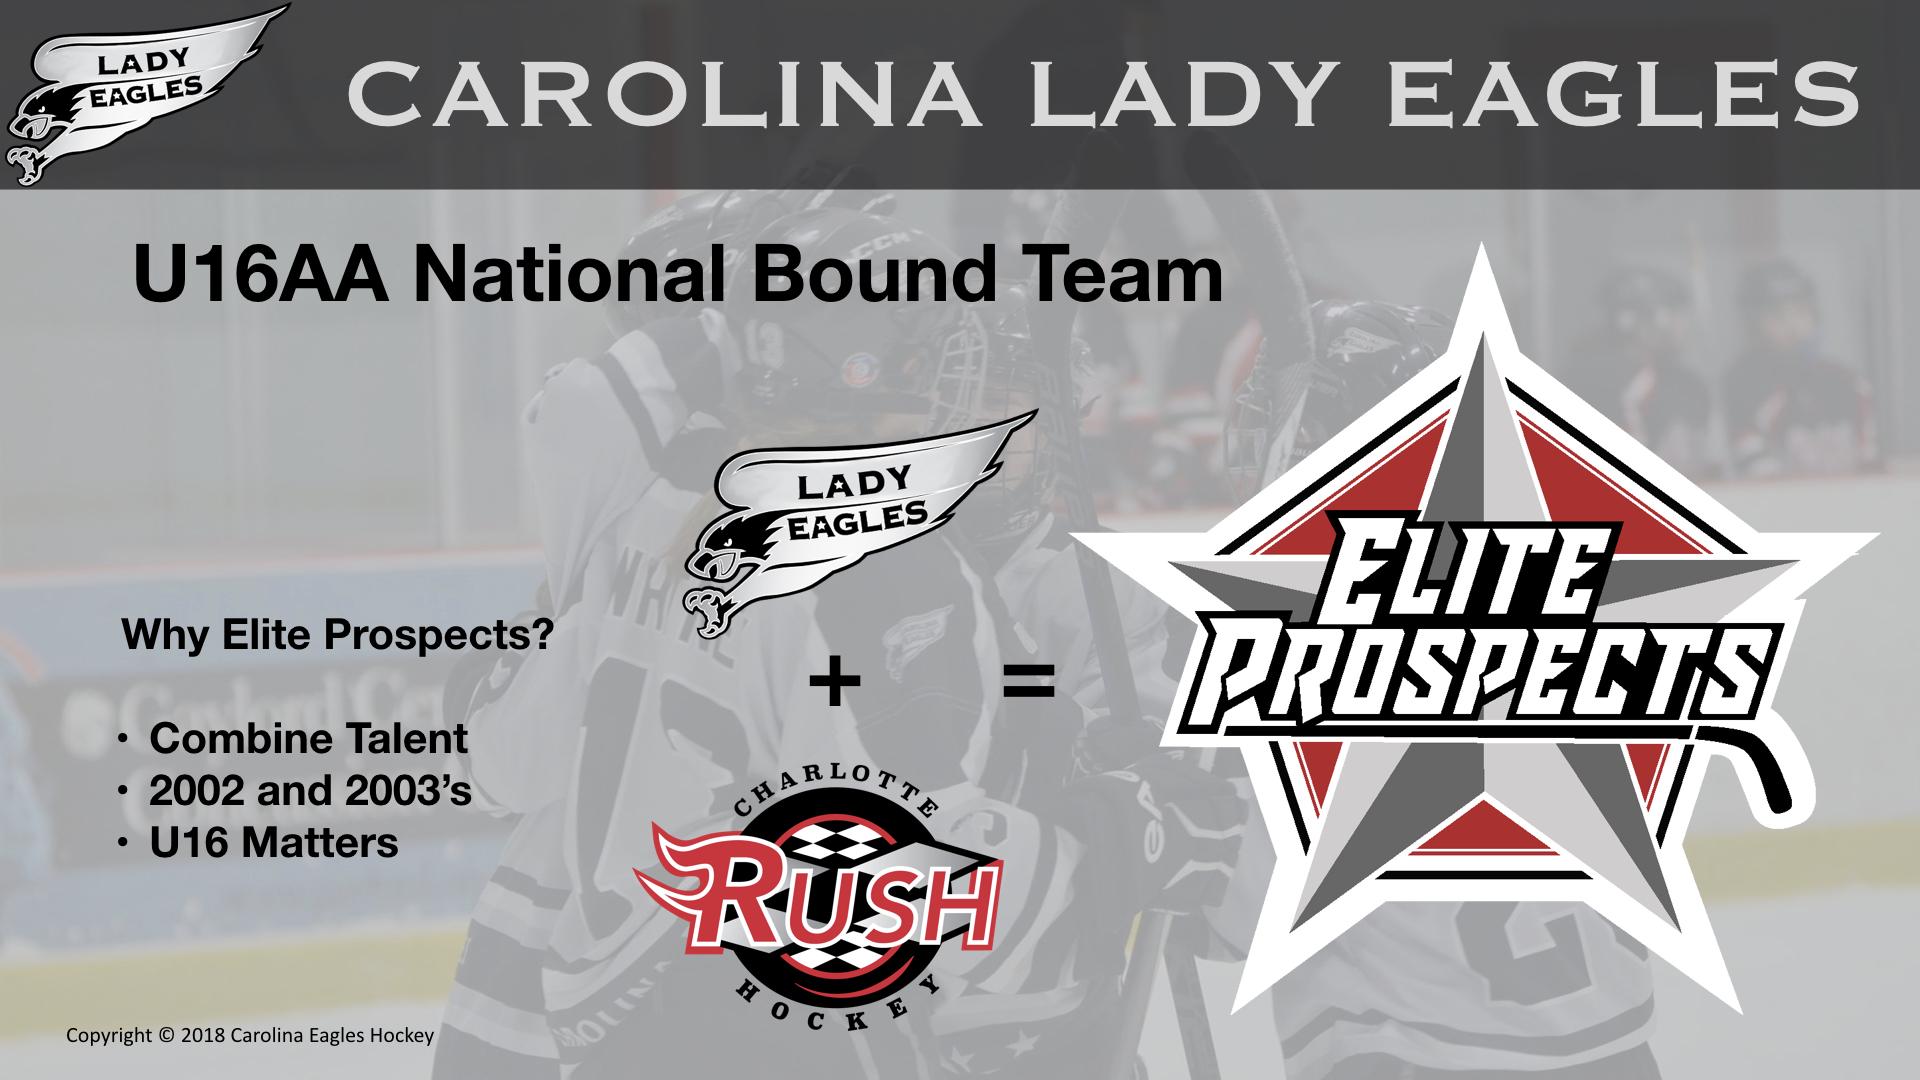 U16AA NB Elite Prospects Team